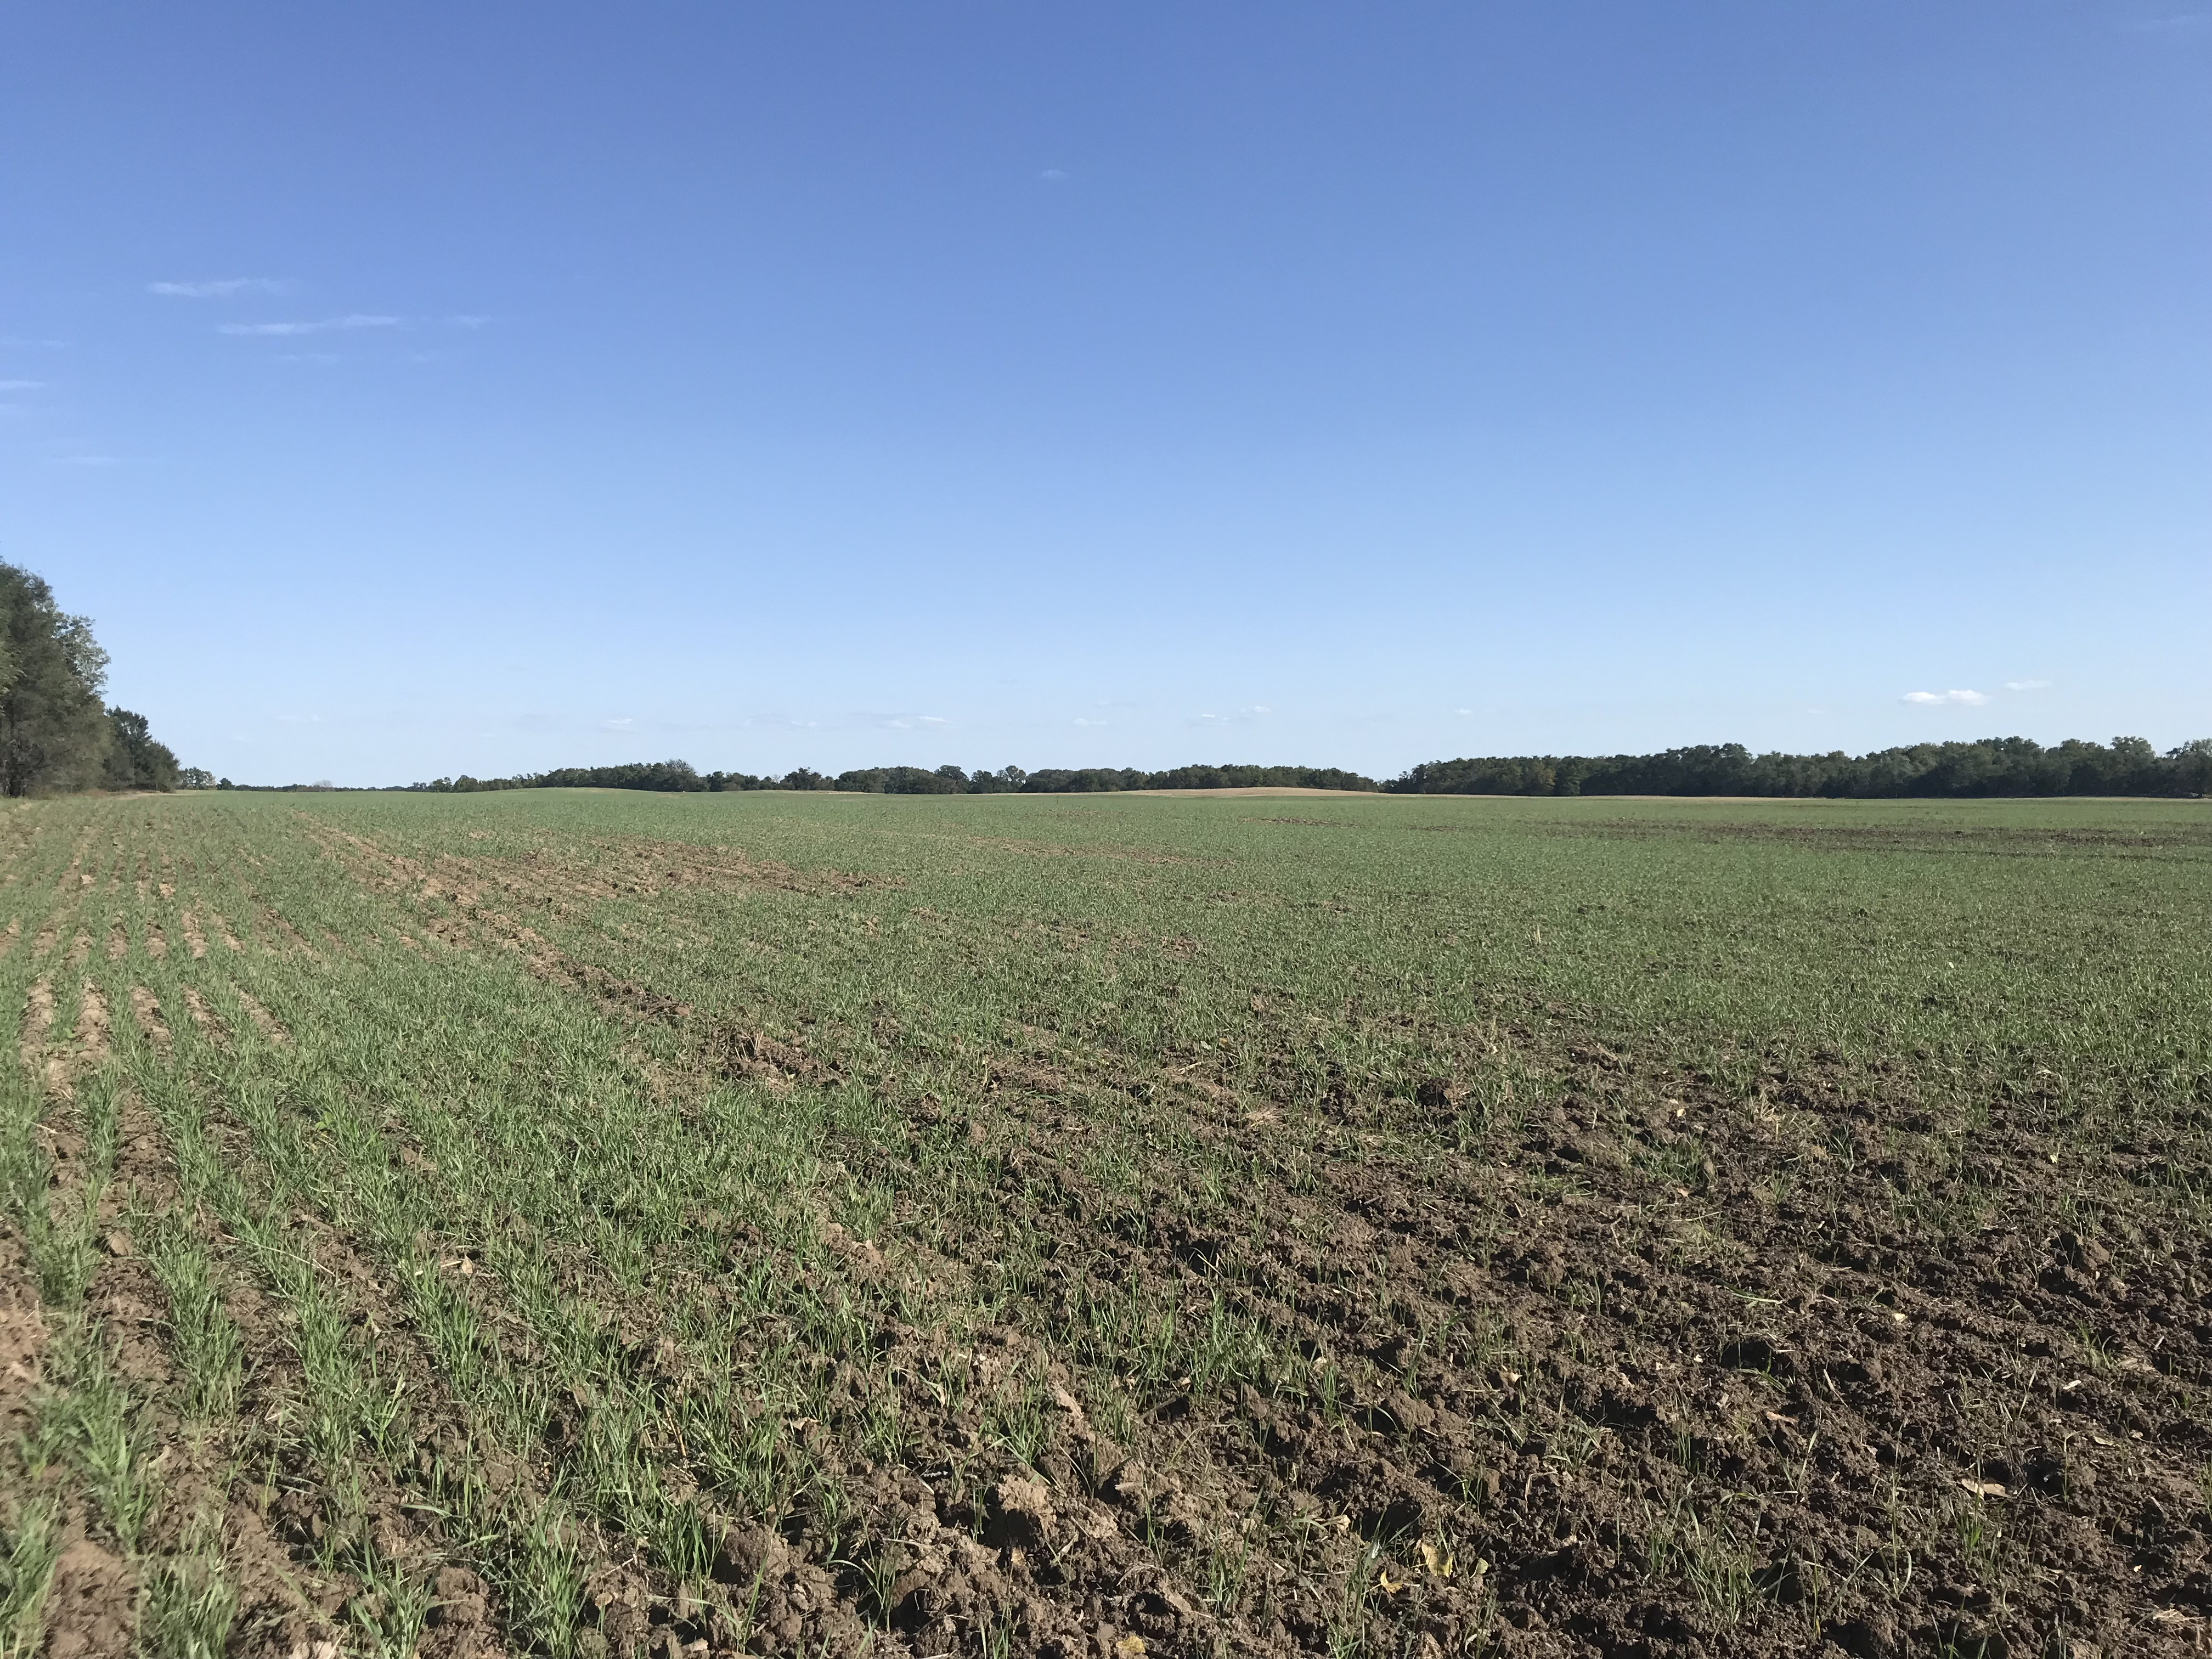 Planted-wheat-10-6-19-2.jpg